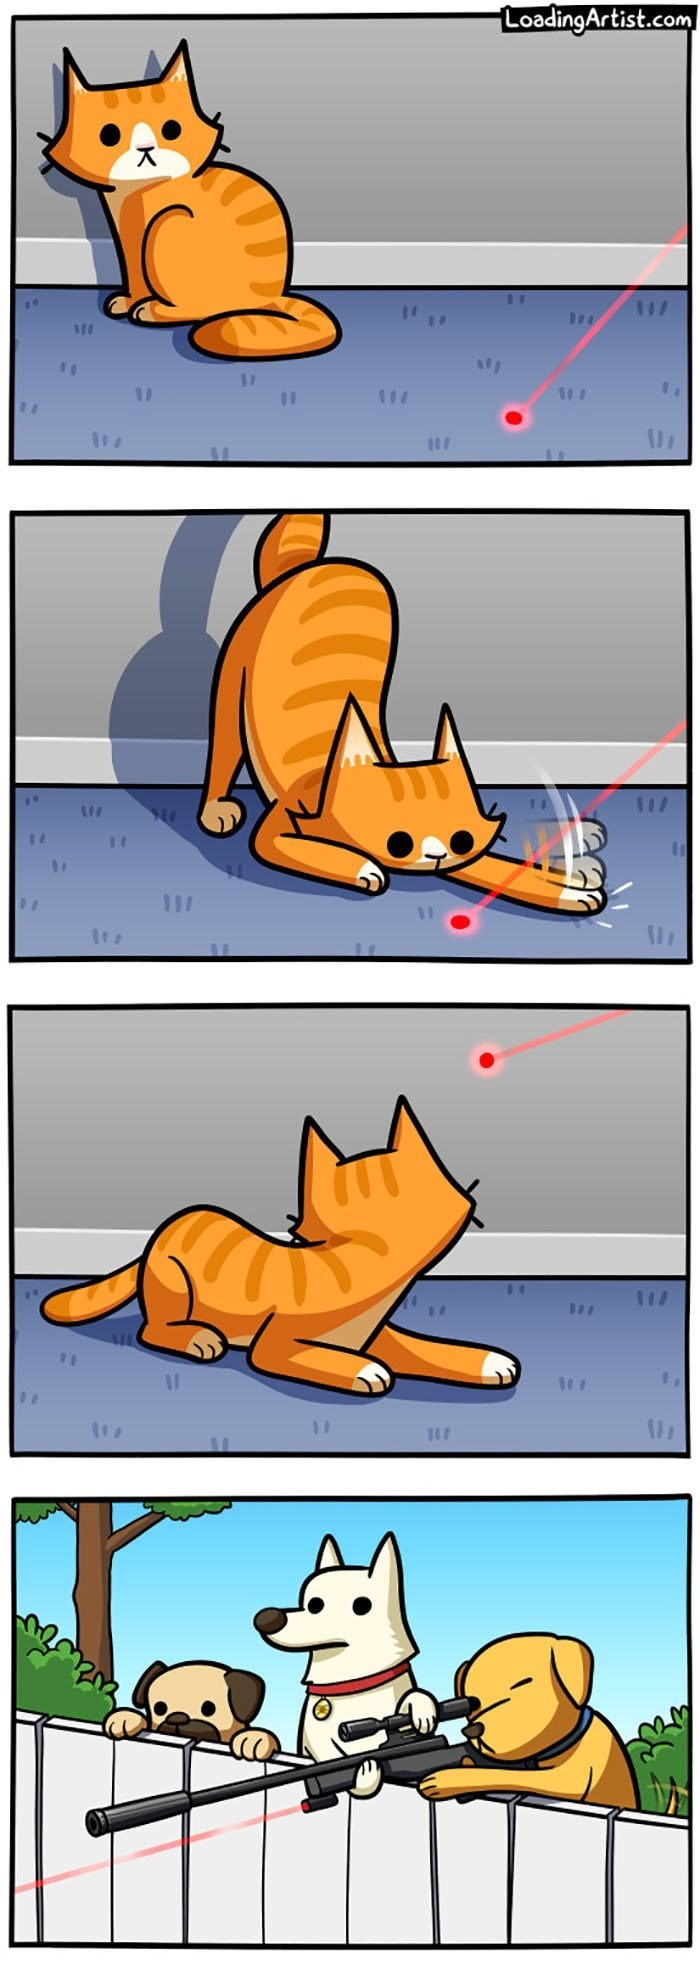 vineta de loadingartist gato muy curioso